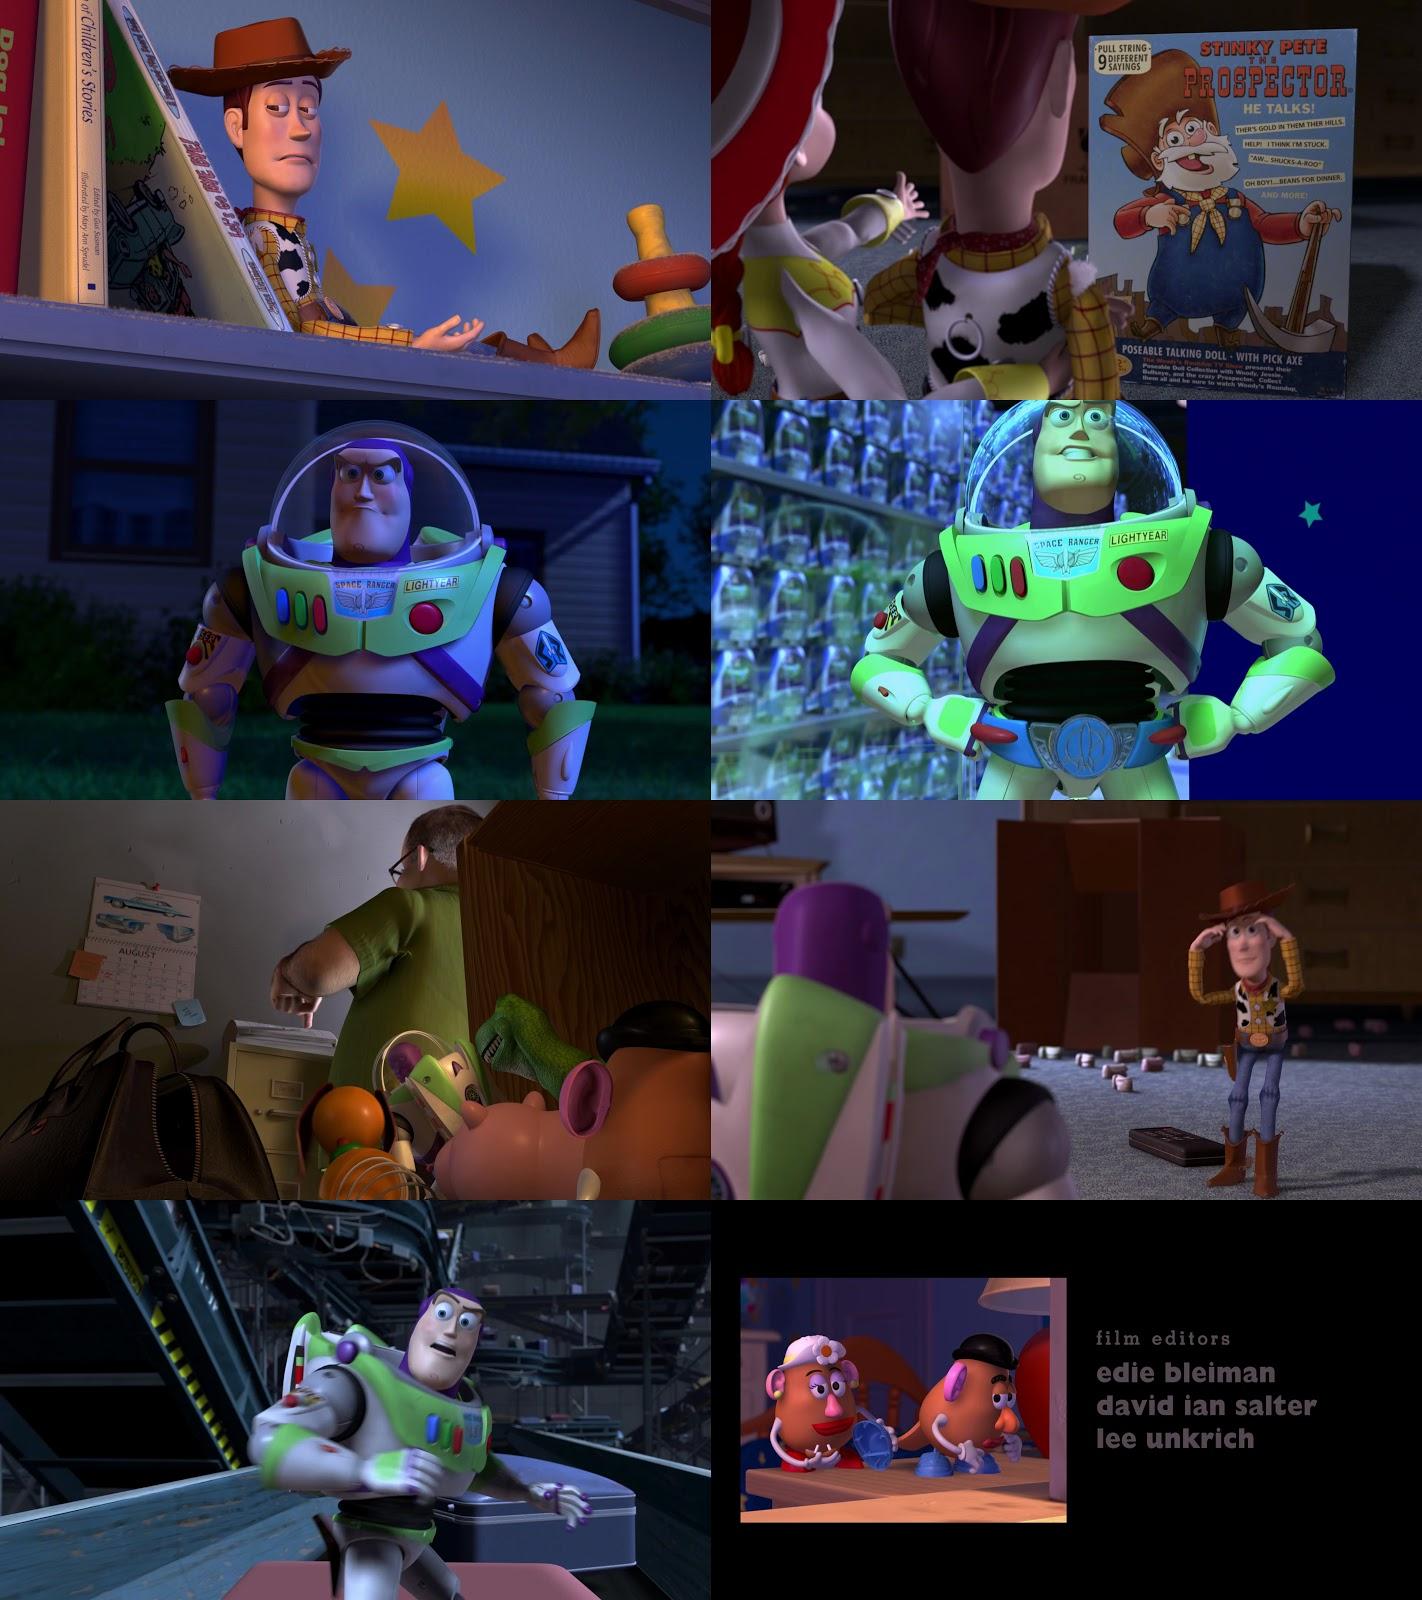 Que Significa En Espaol Toy Story The Blouse